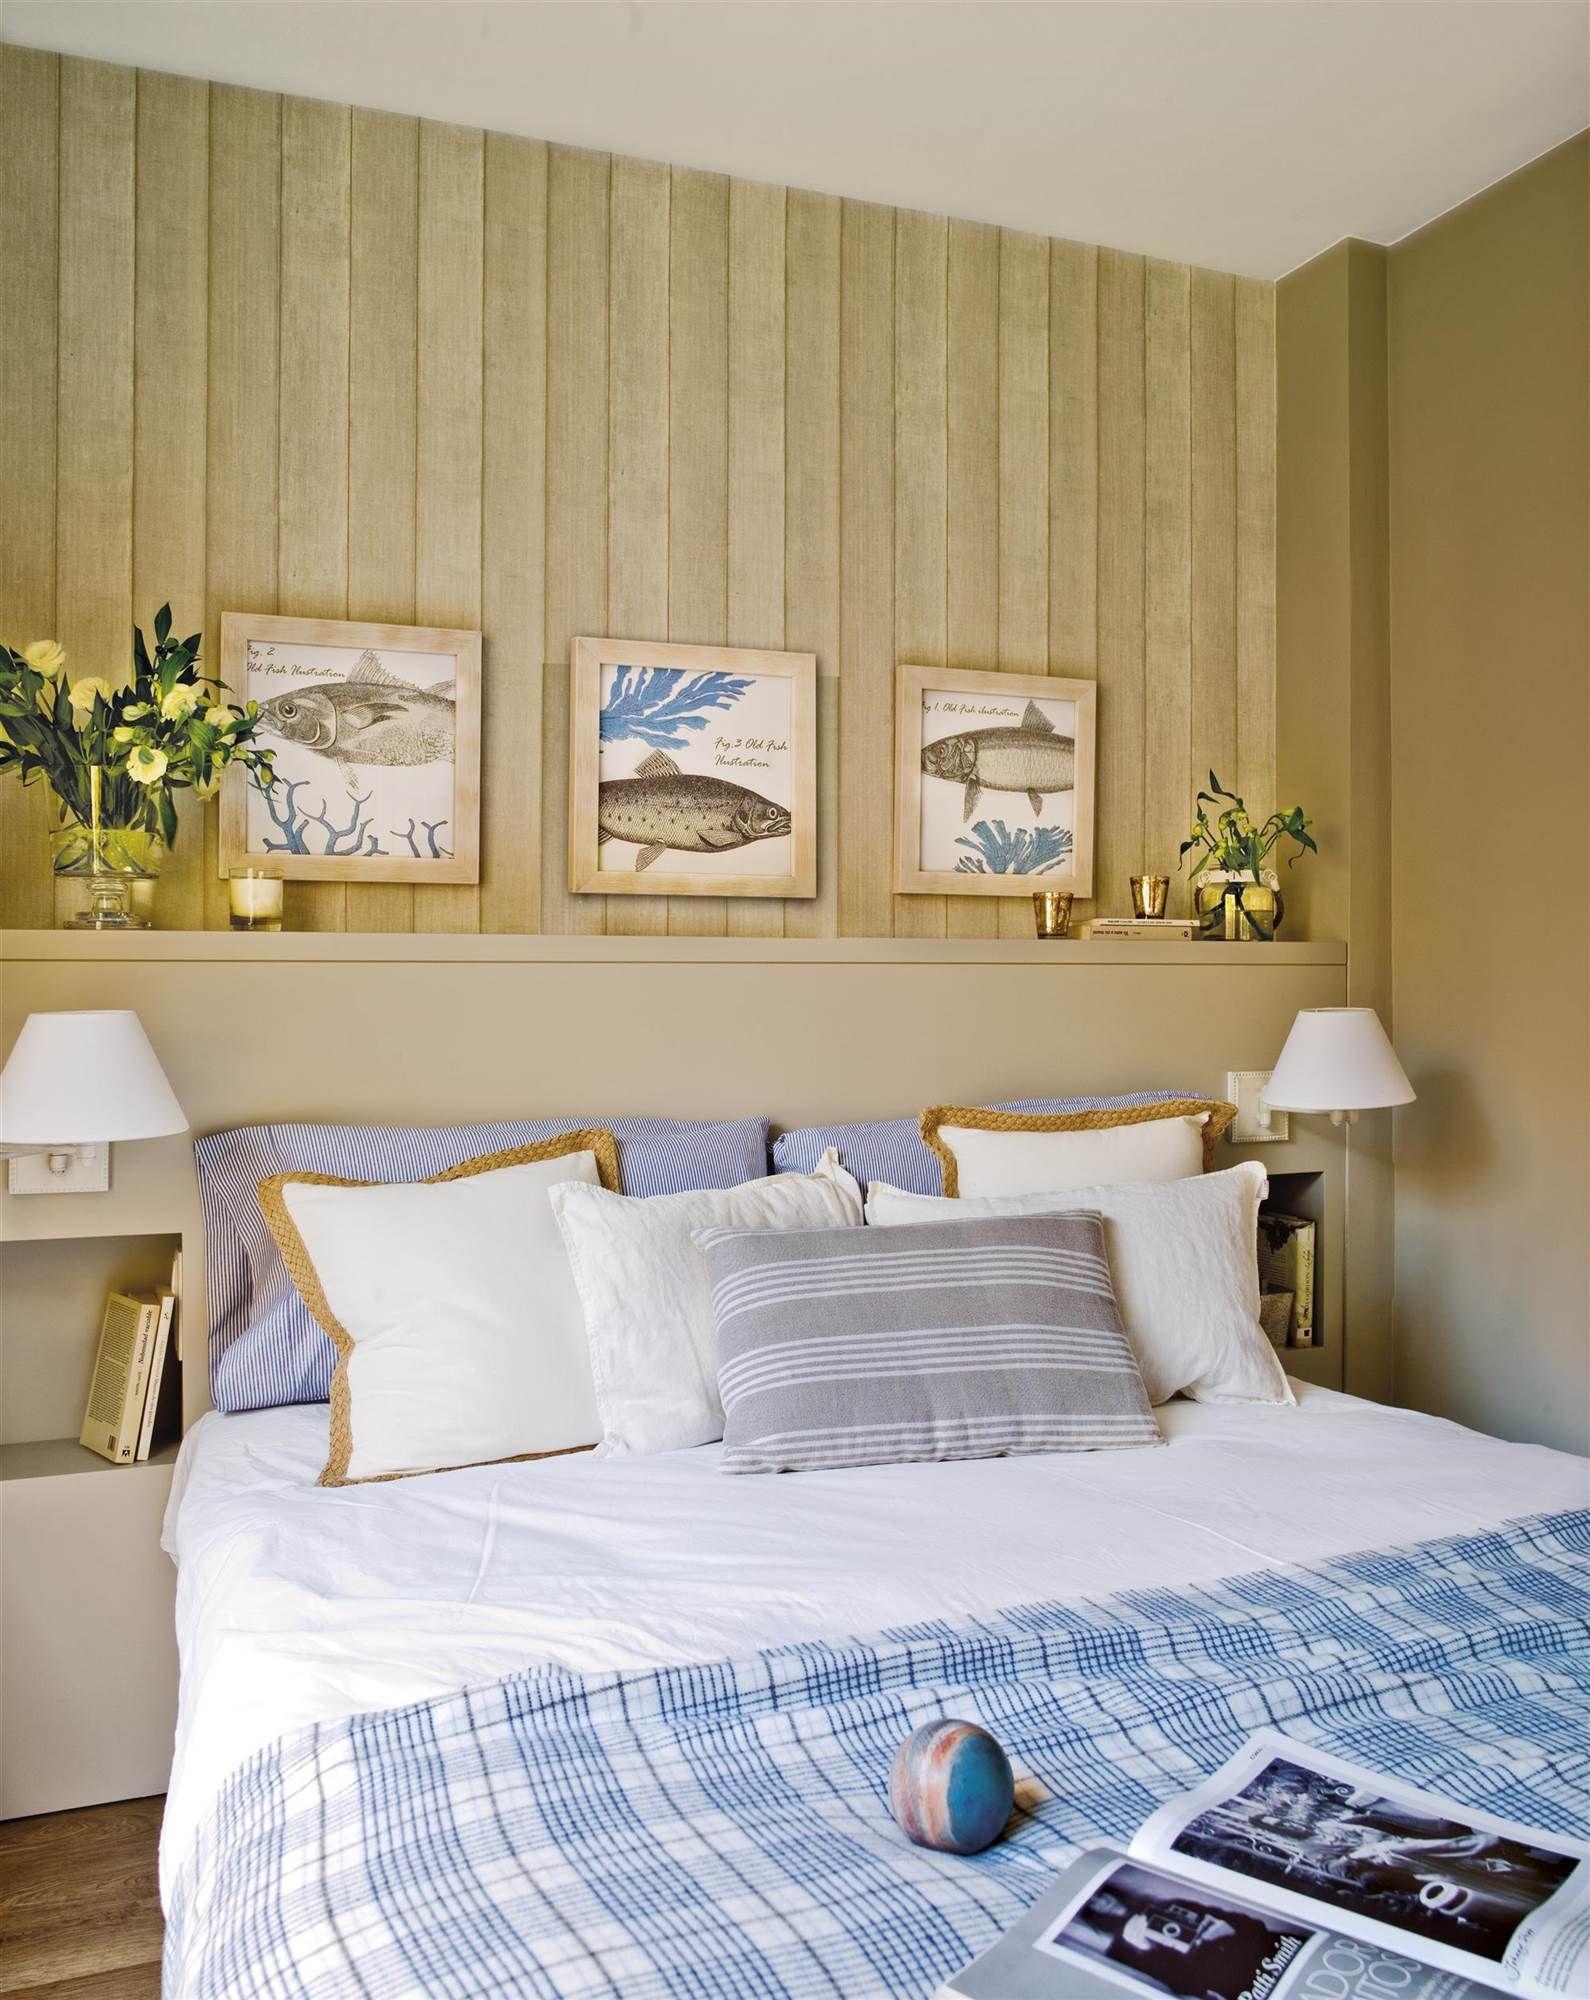 Elegancia En Tonos Grises Dormitorios Decoracion Habitacion Matrimonial Decoracion Dormitorios